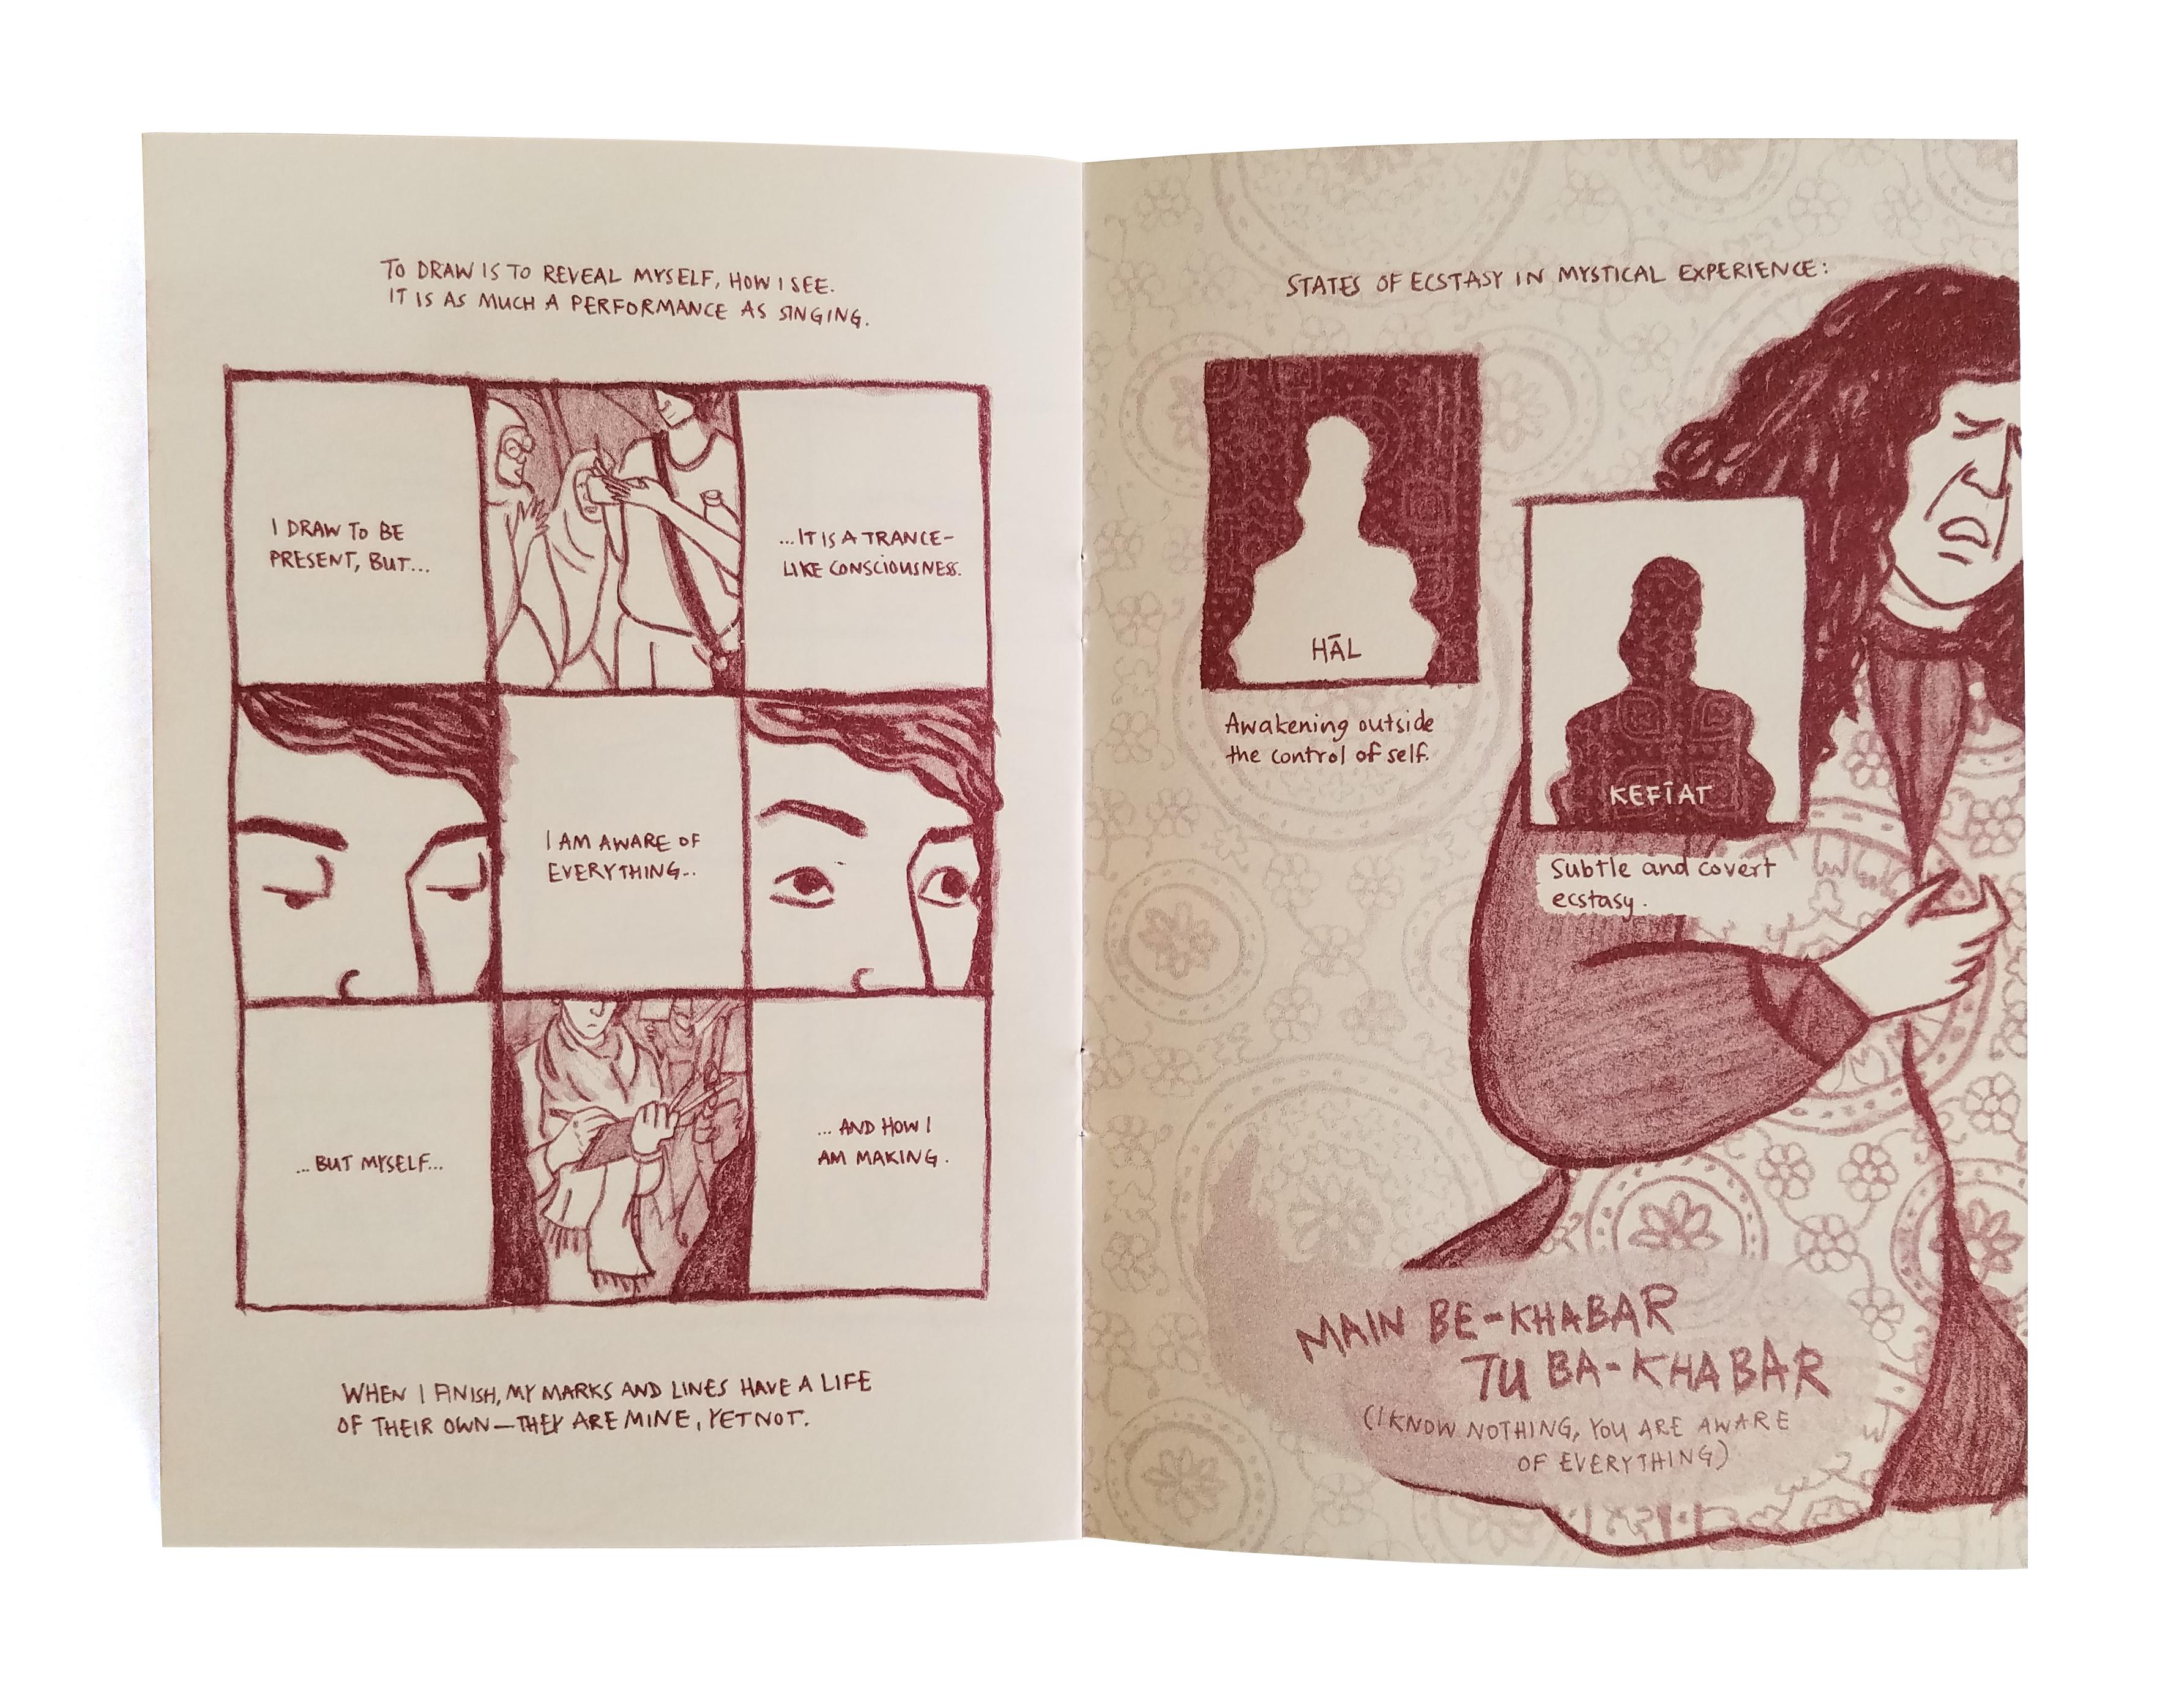 GirlsclubAsia-Artist-Shreyas-R-Krishnan-SRK_MaqsoodIKainaat